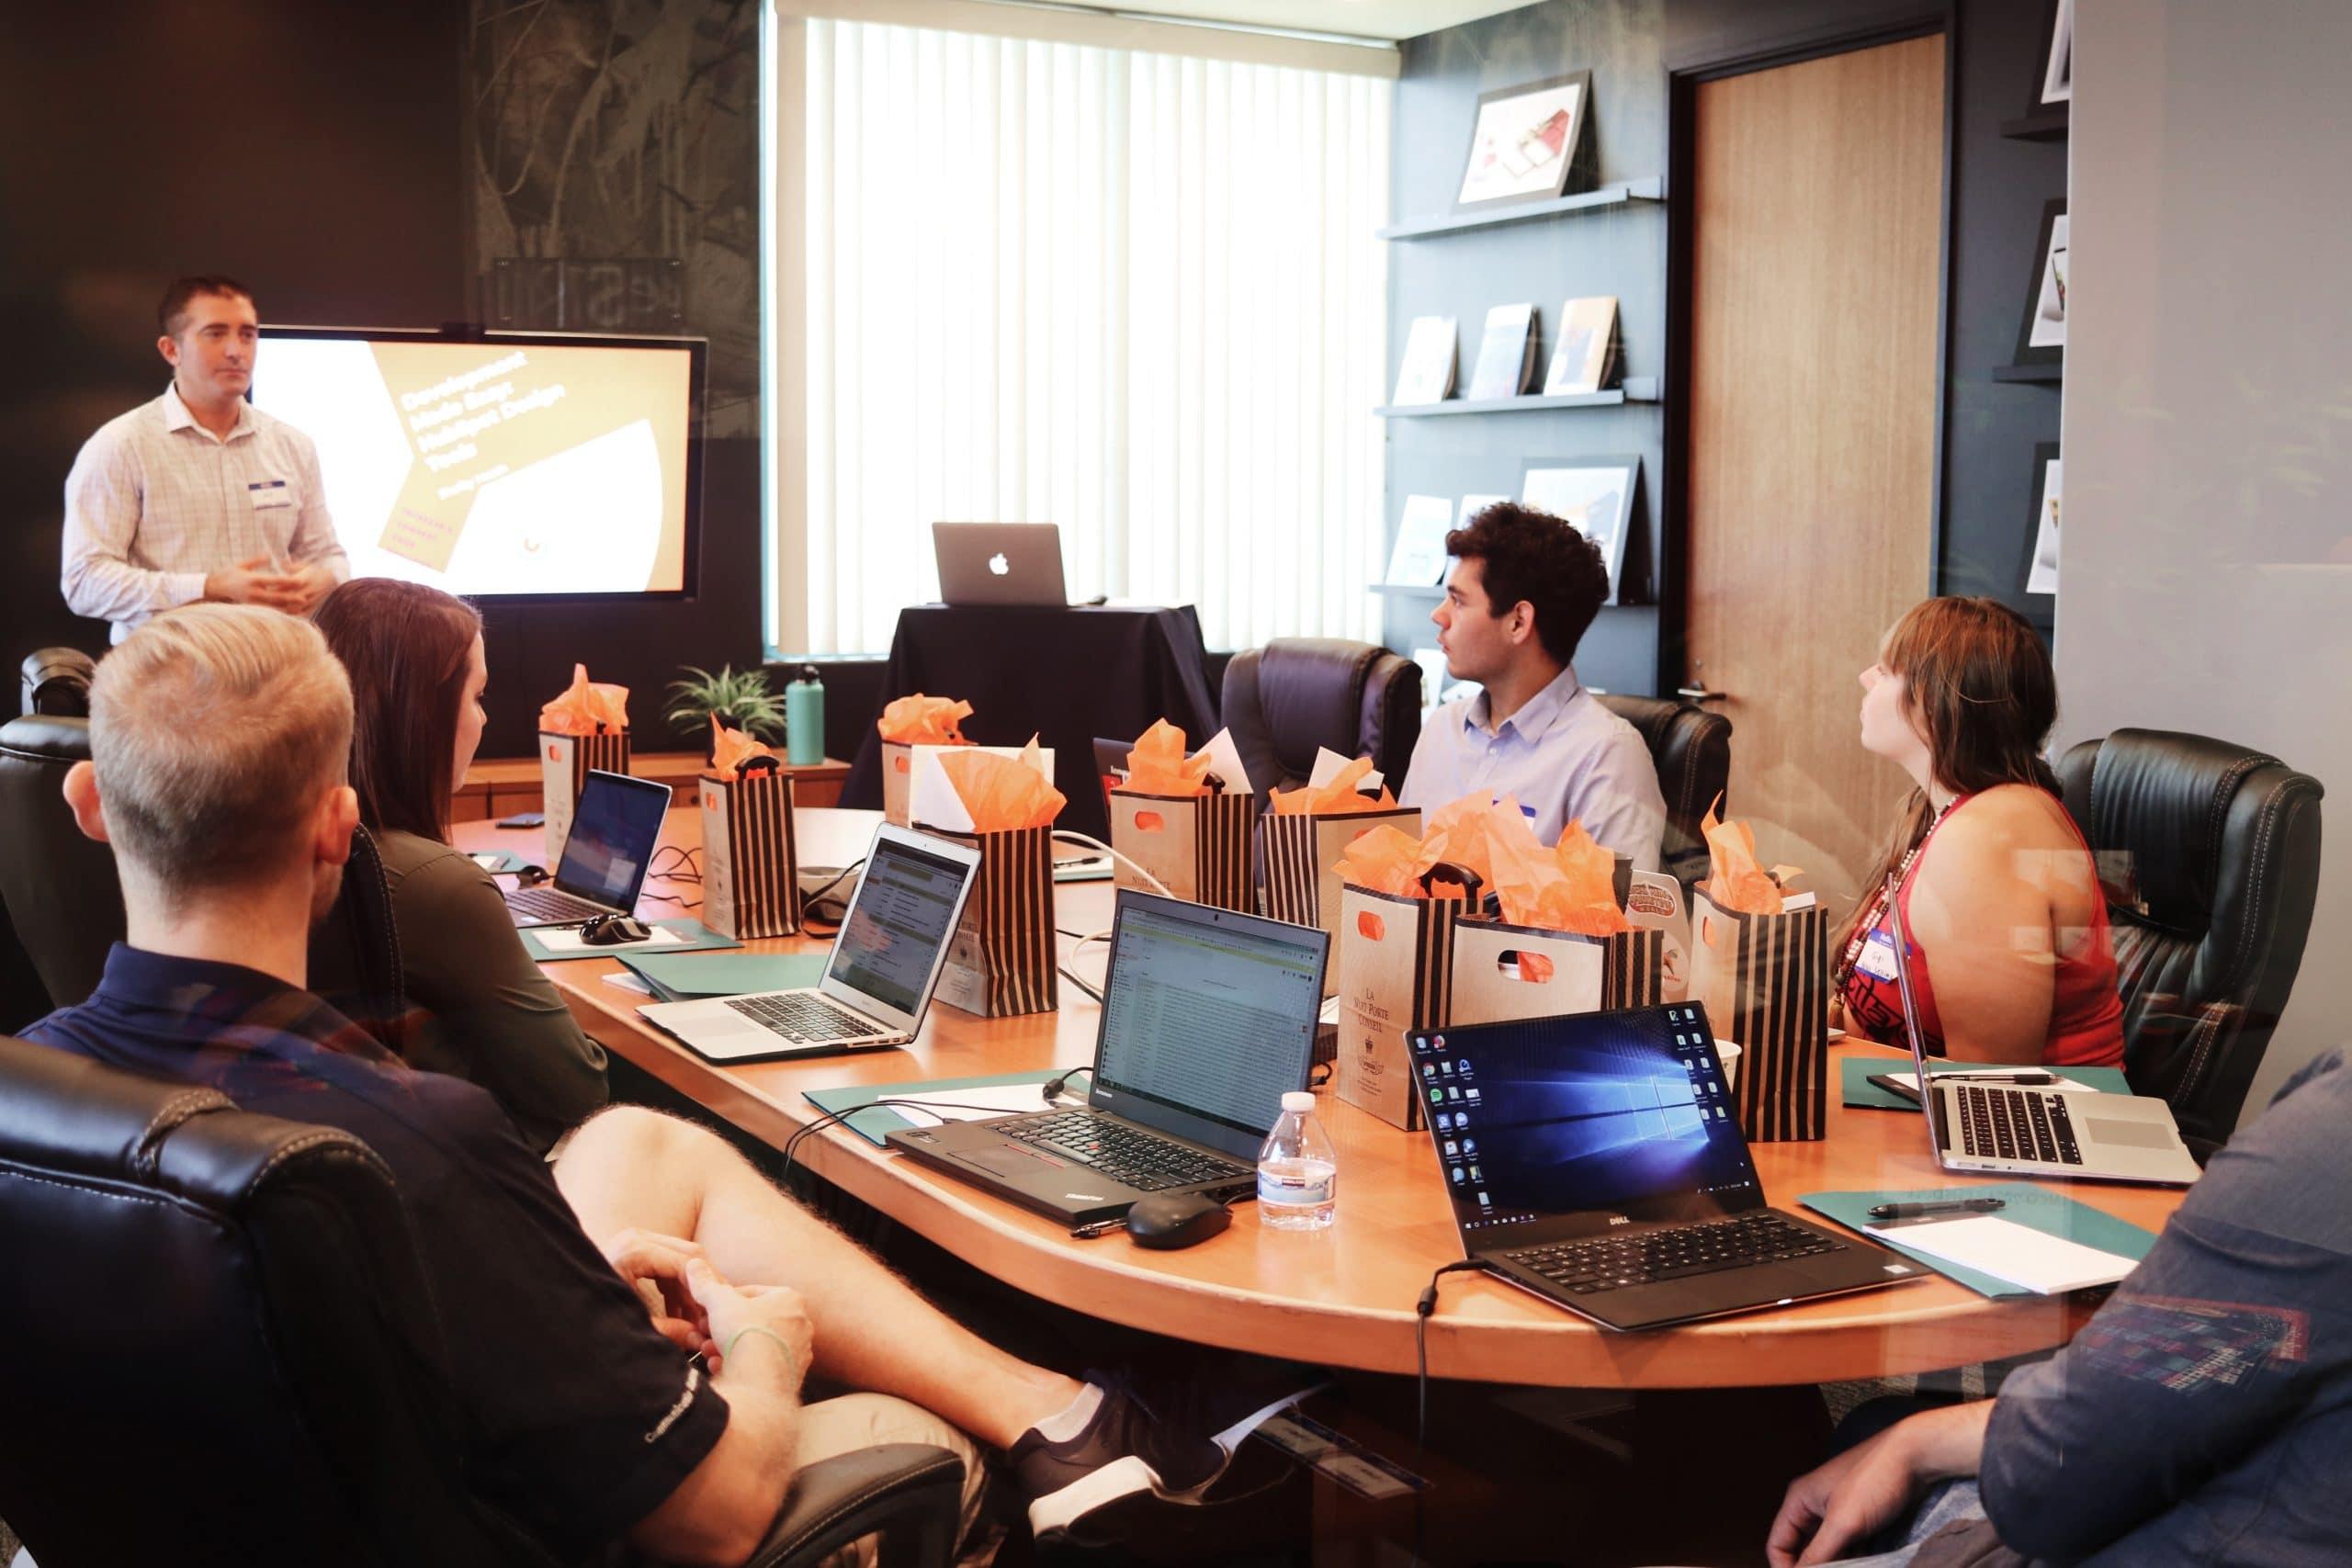 IT budget presentation image